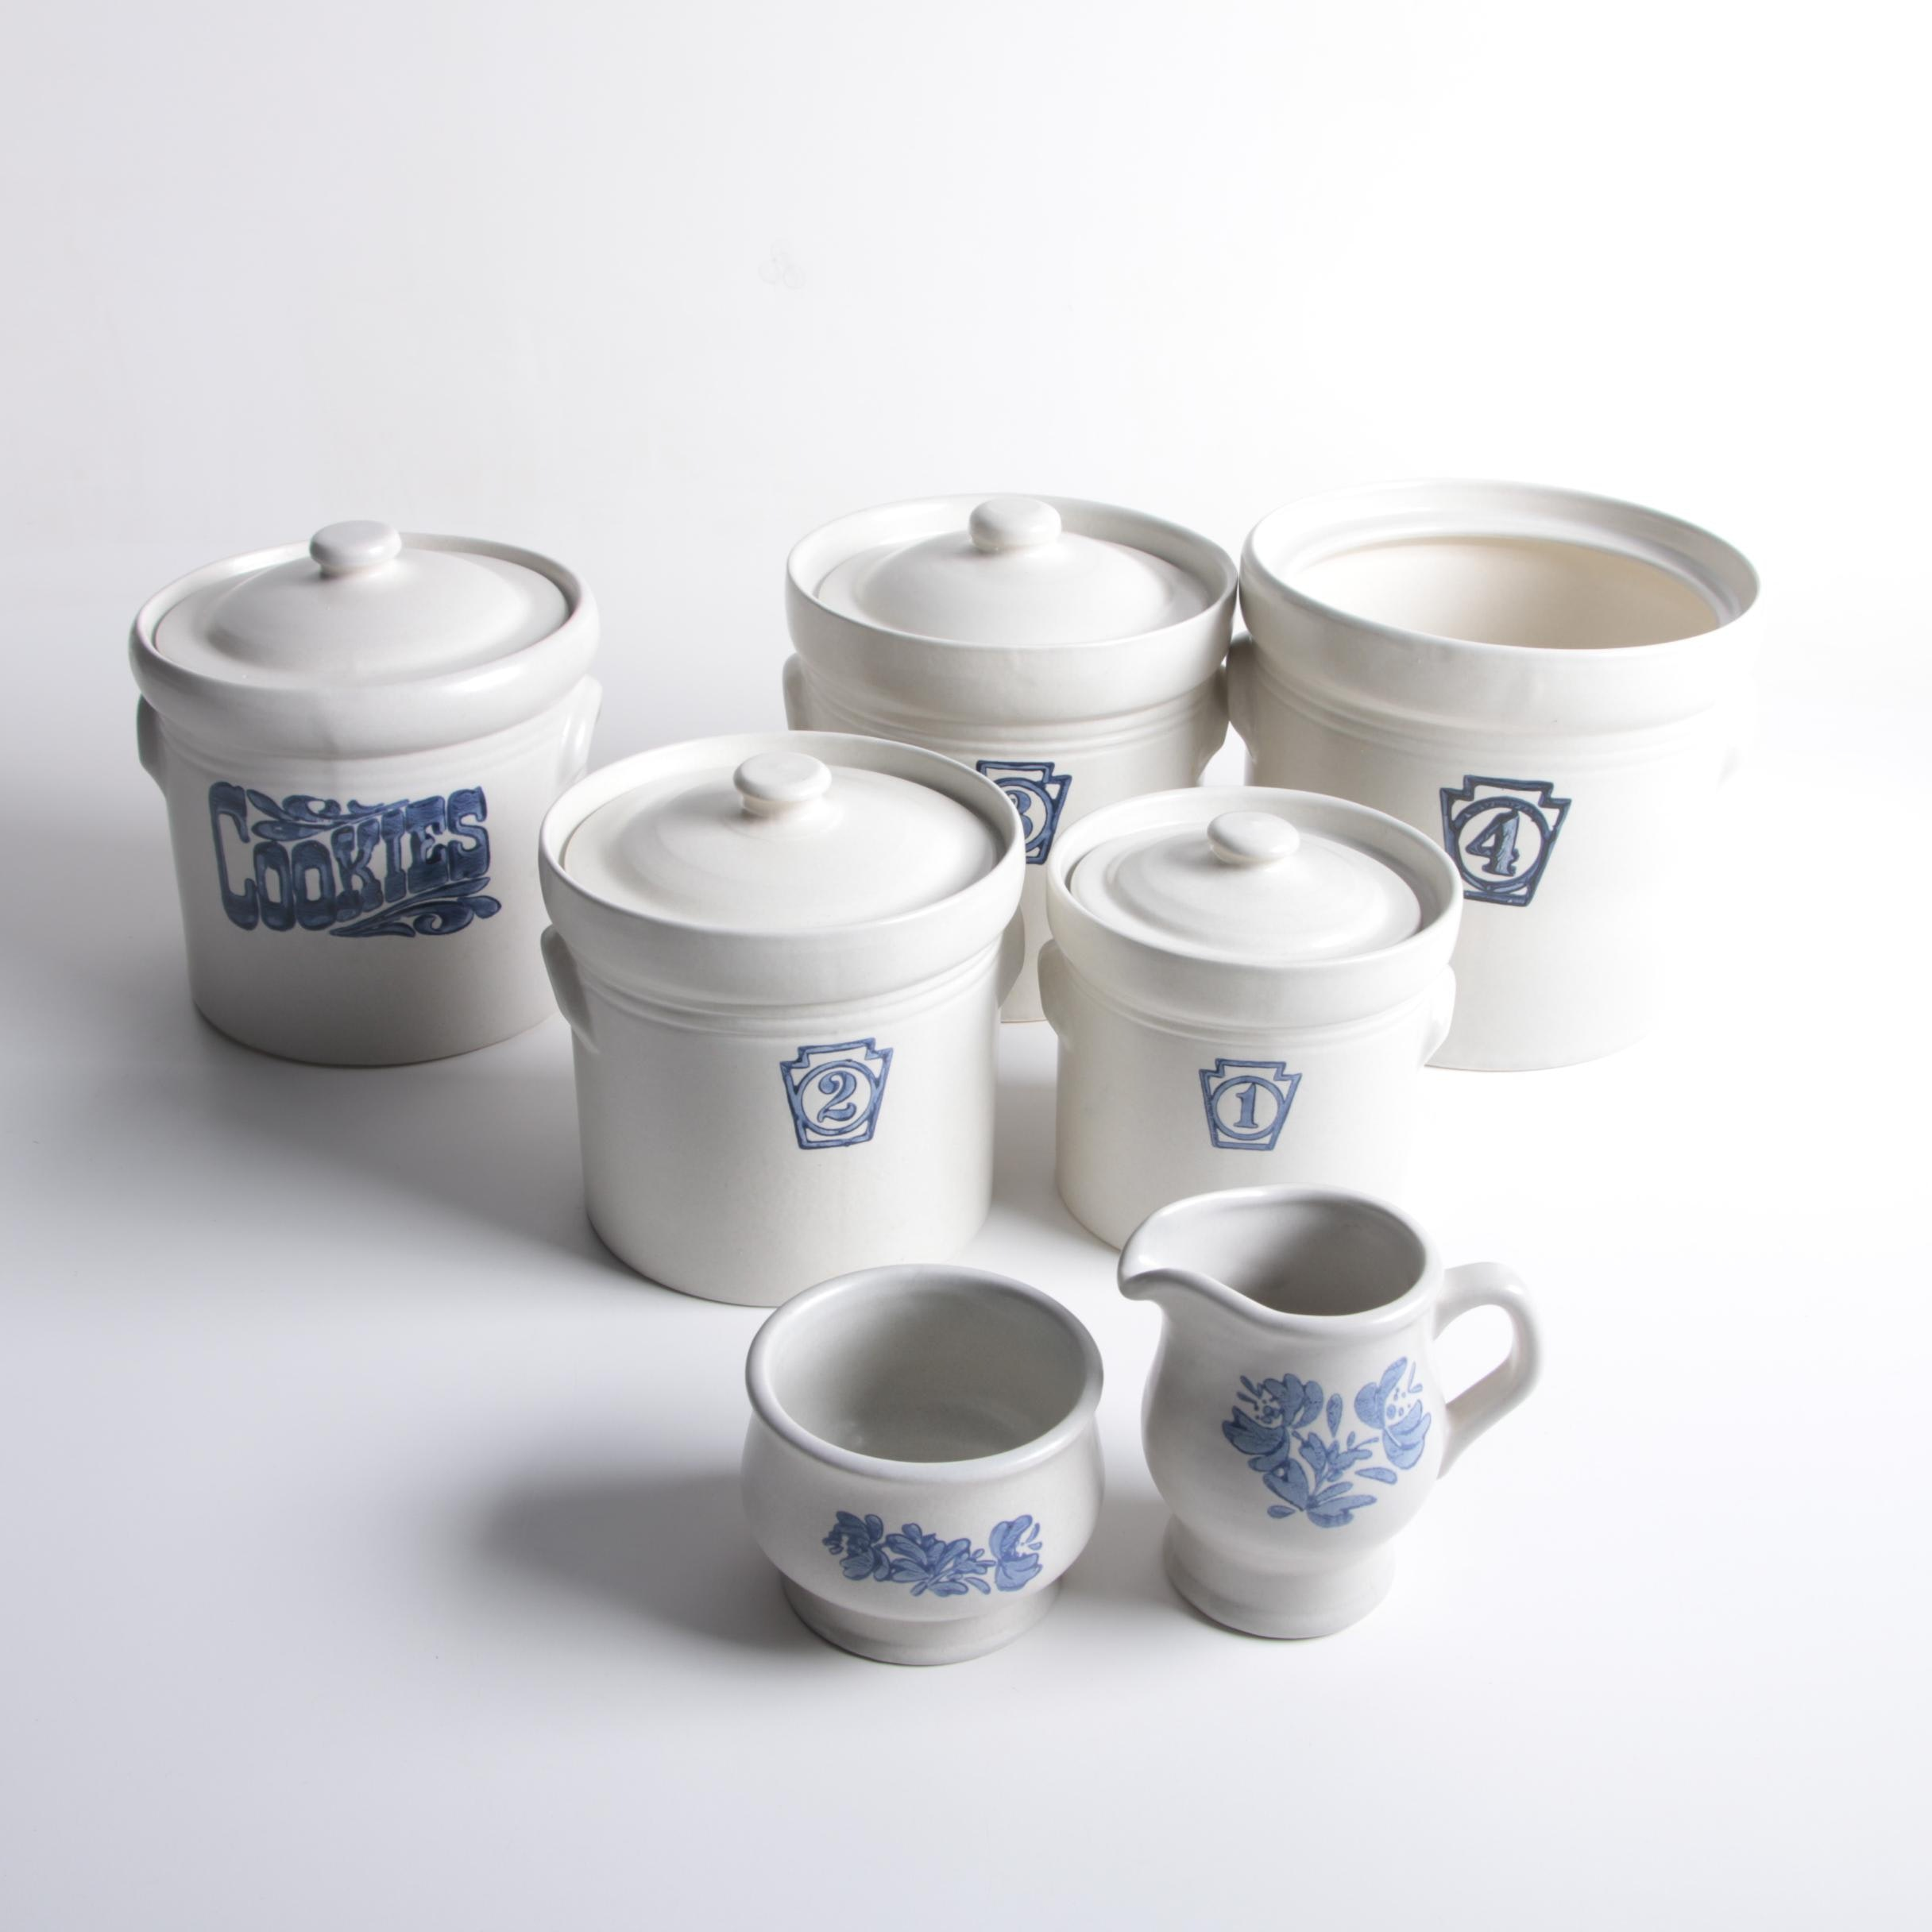 "Pfaltzgraff ""Yorktowne"" Stoneware Kitchen Canisters and Creamer with Sugar"